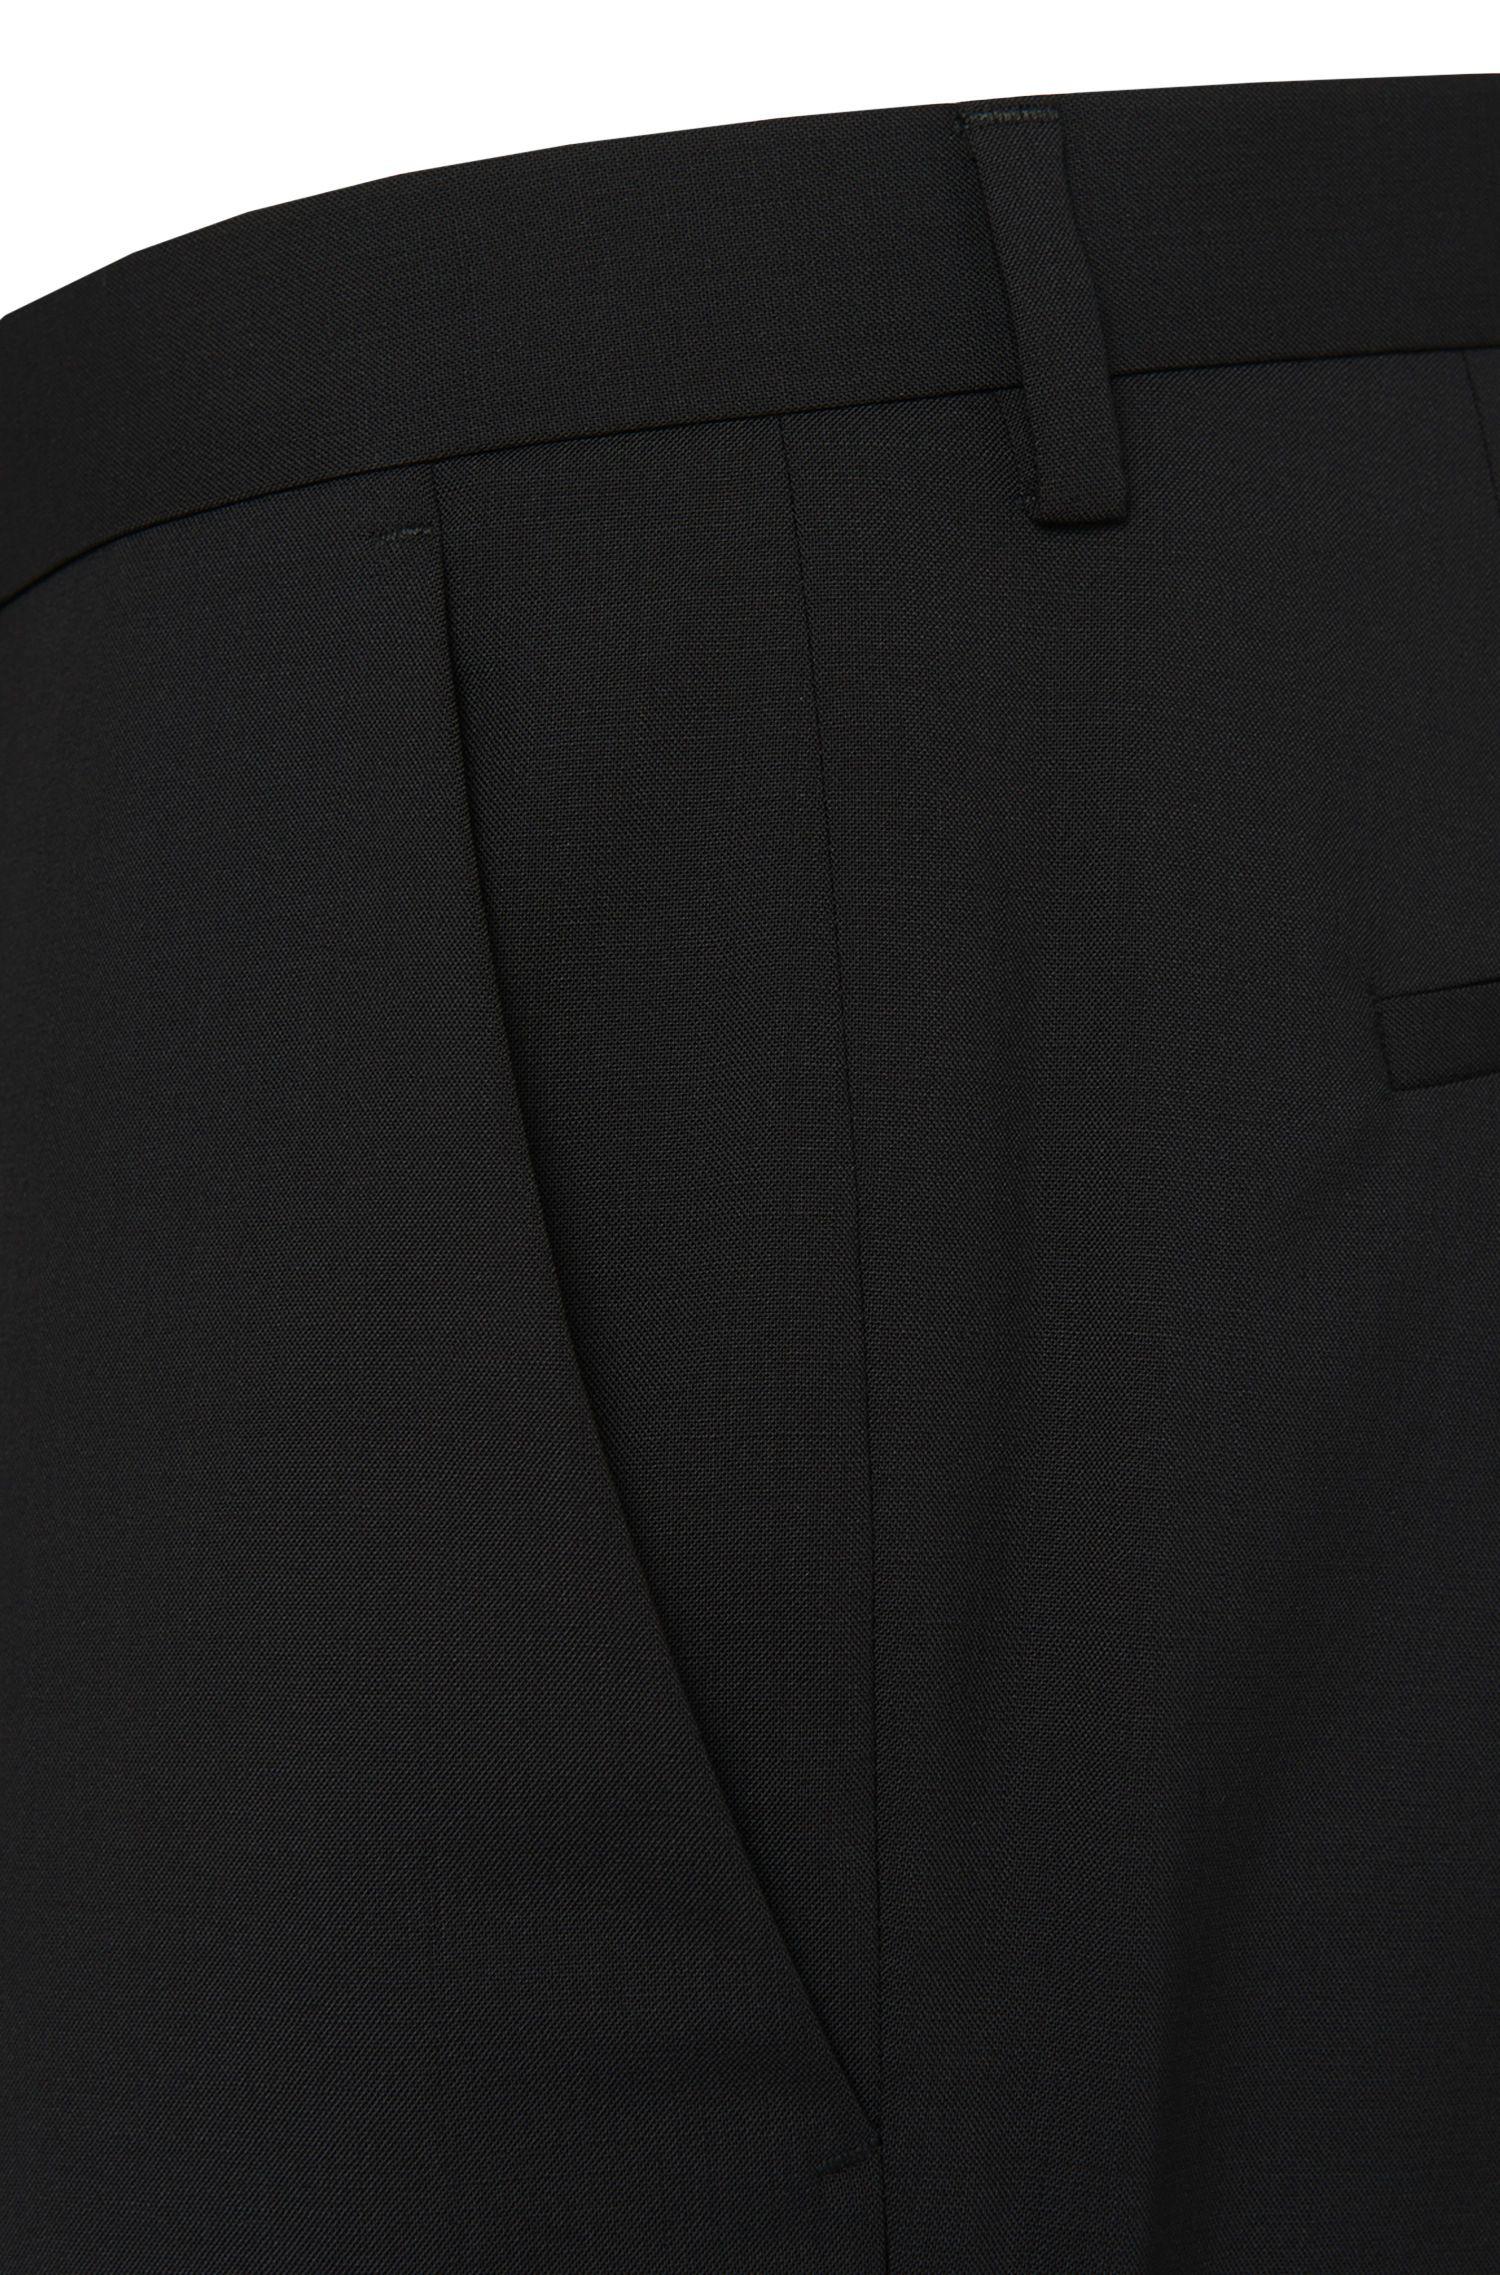 'Shout' | Regular Fit, Stretch Virgin Wool Dress Pants , Black